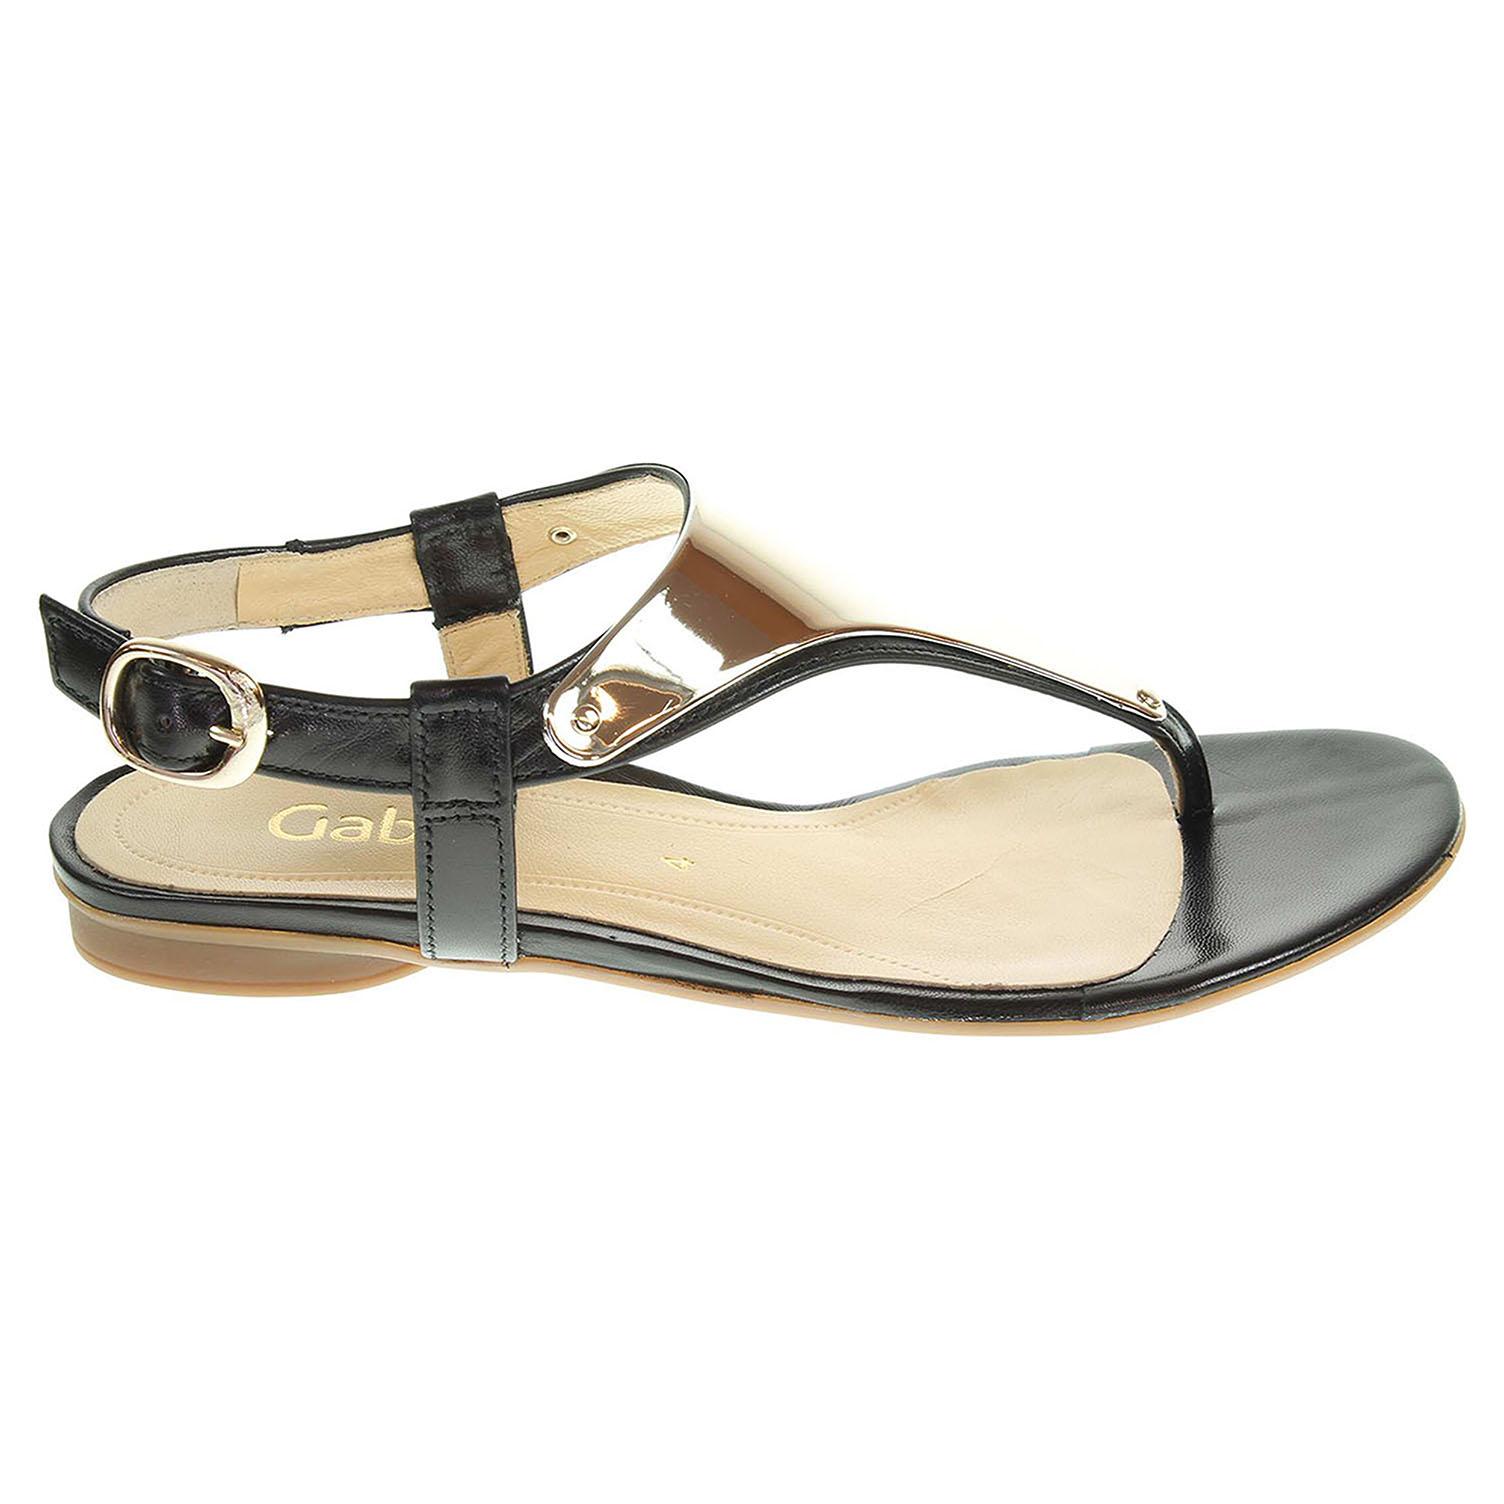 Ecco Gabor dámské sandály 25.532.37 černé 23800923